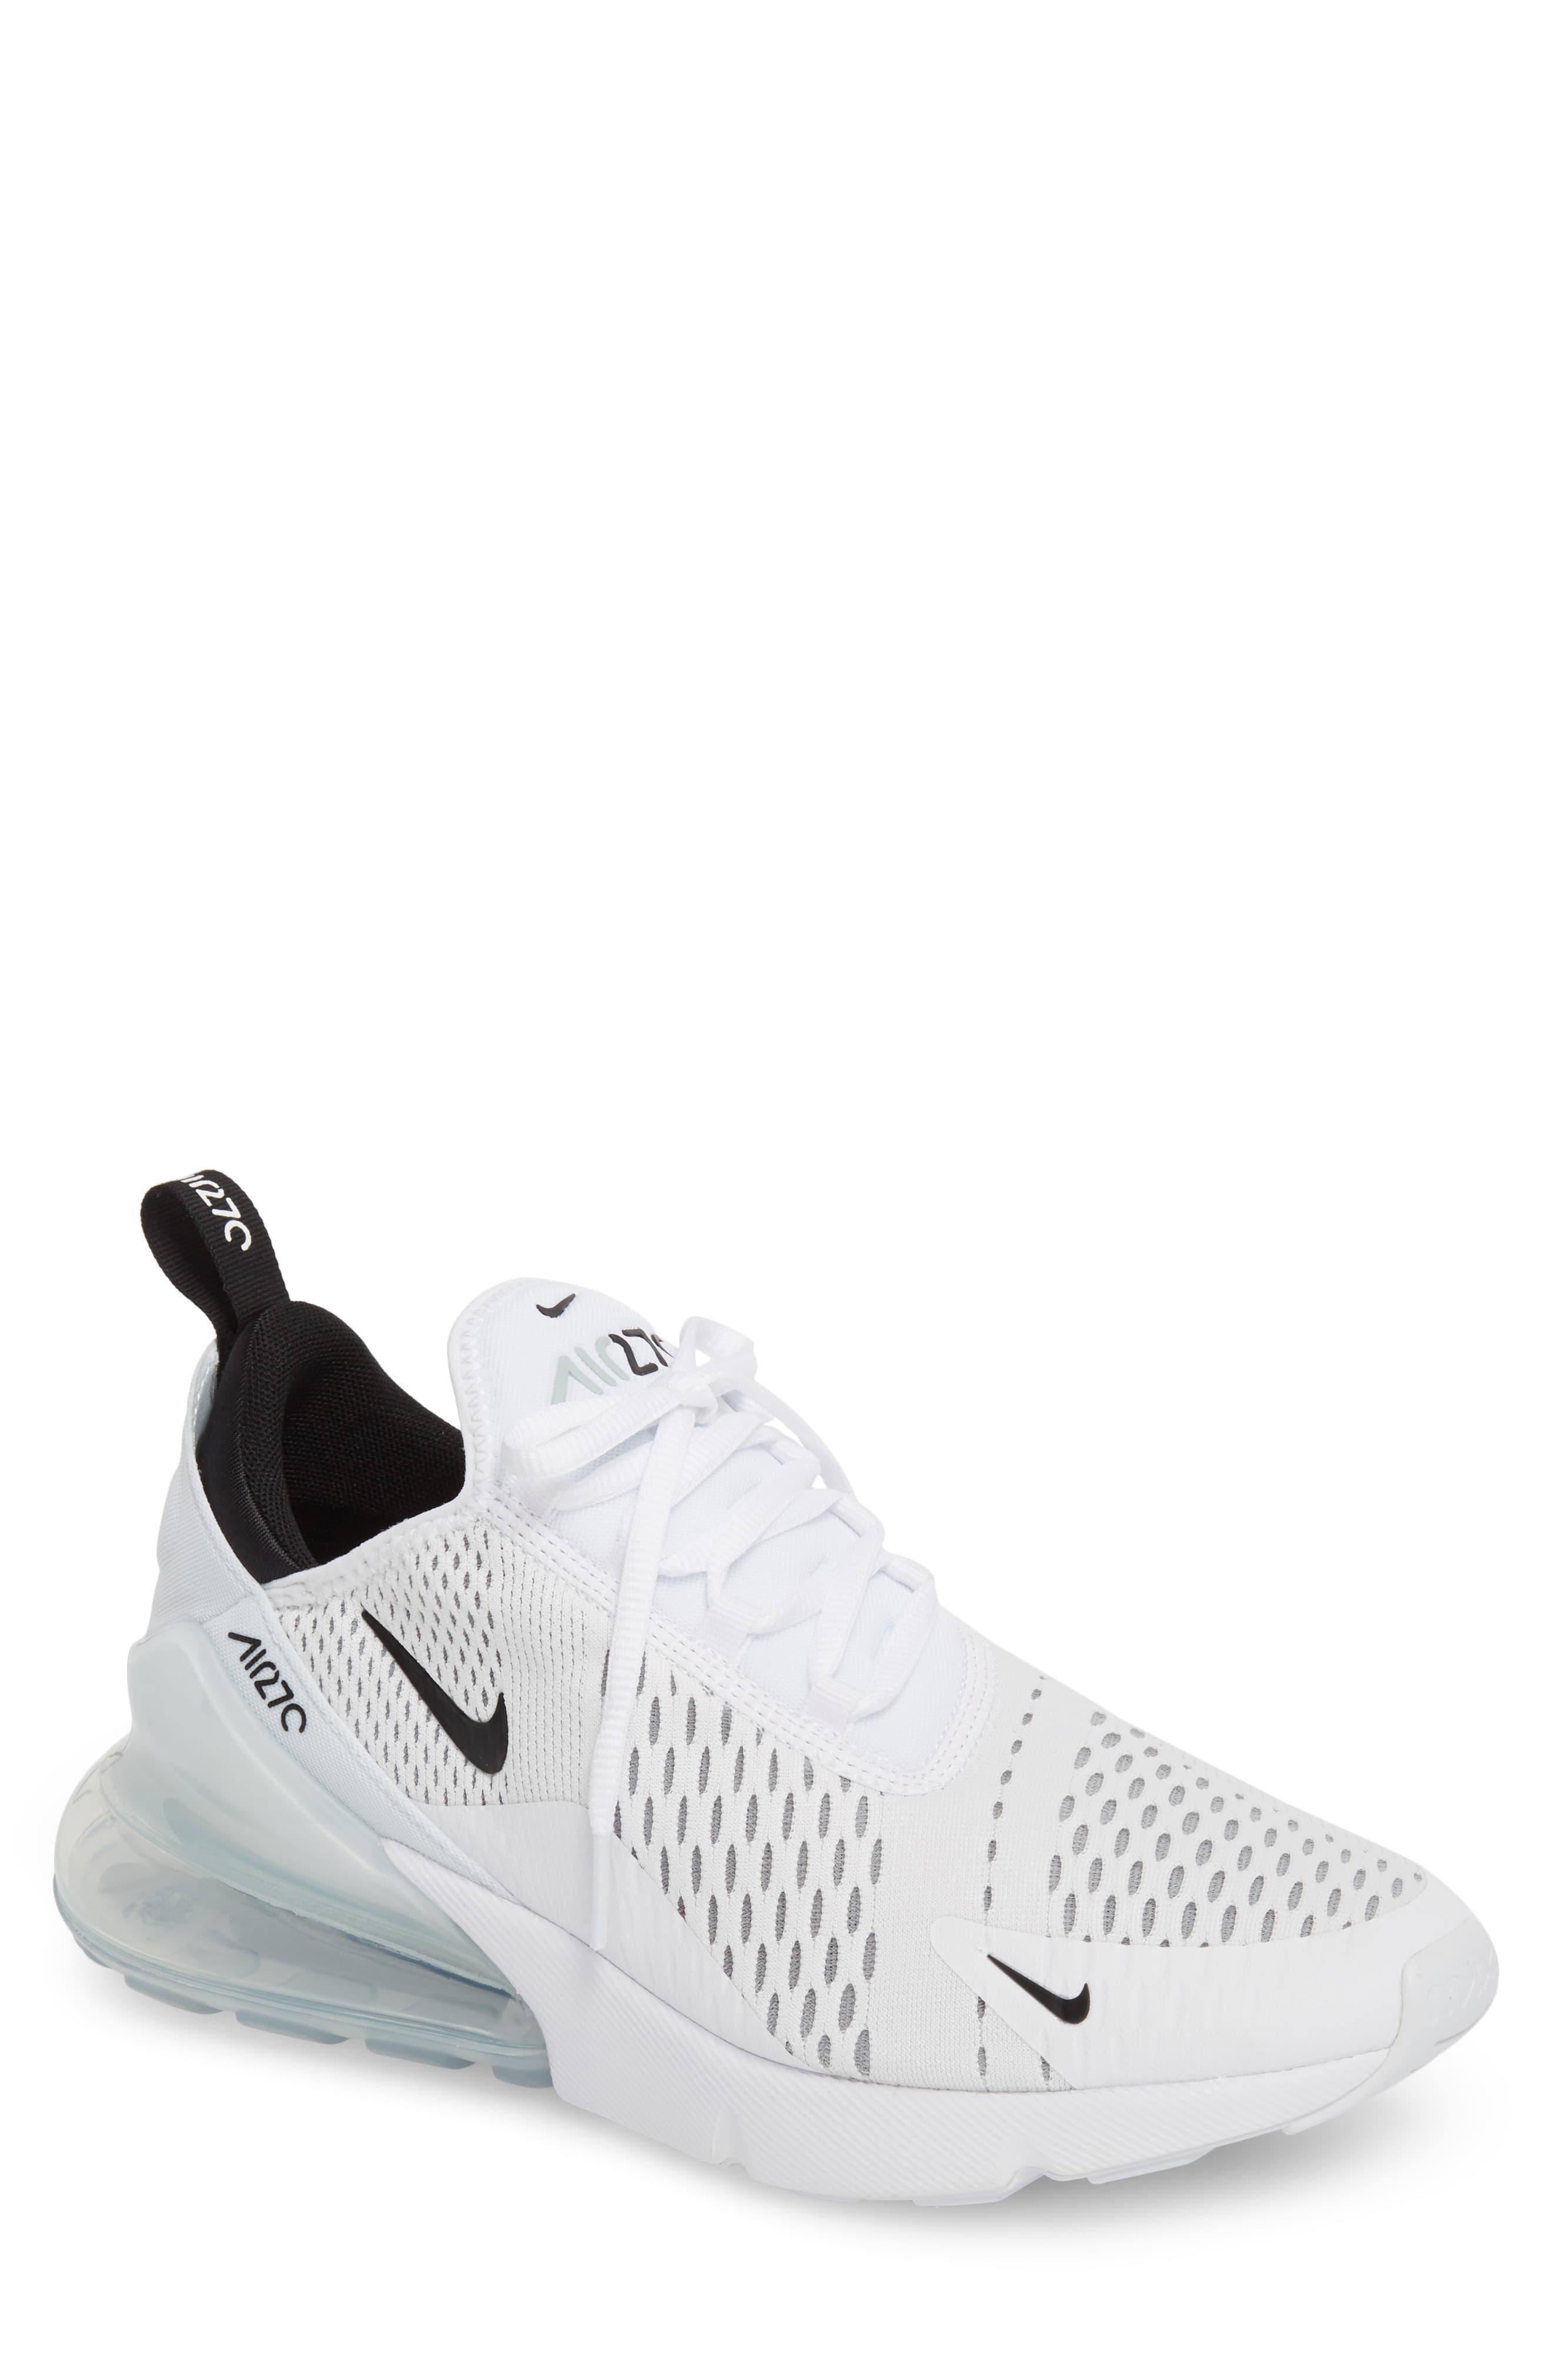 Men's Nike Air Max 270 Sneaker, Size 14 M - White   Sneakers ...